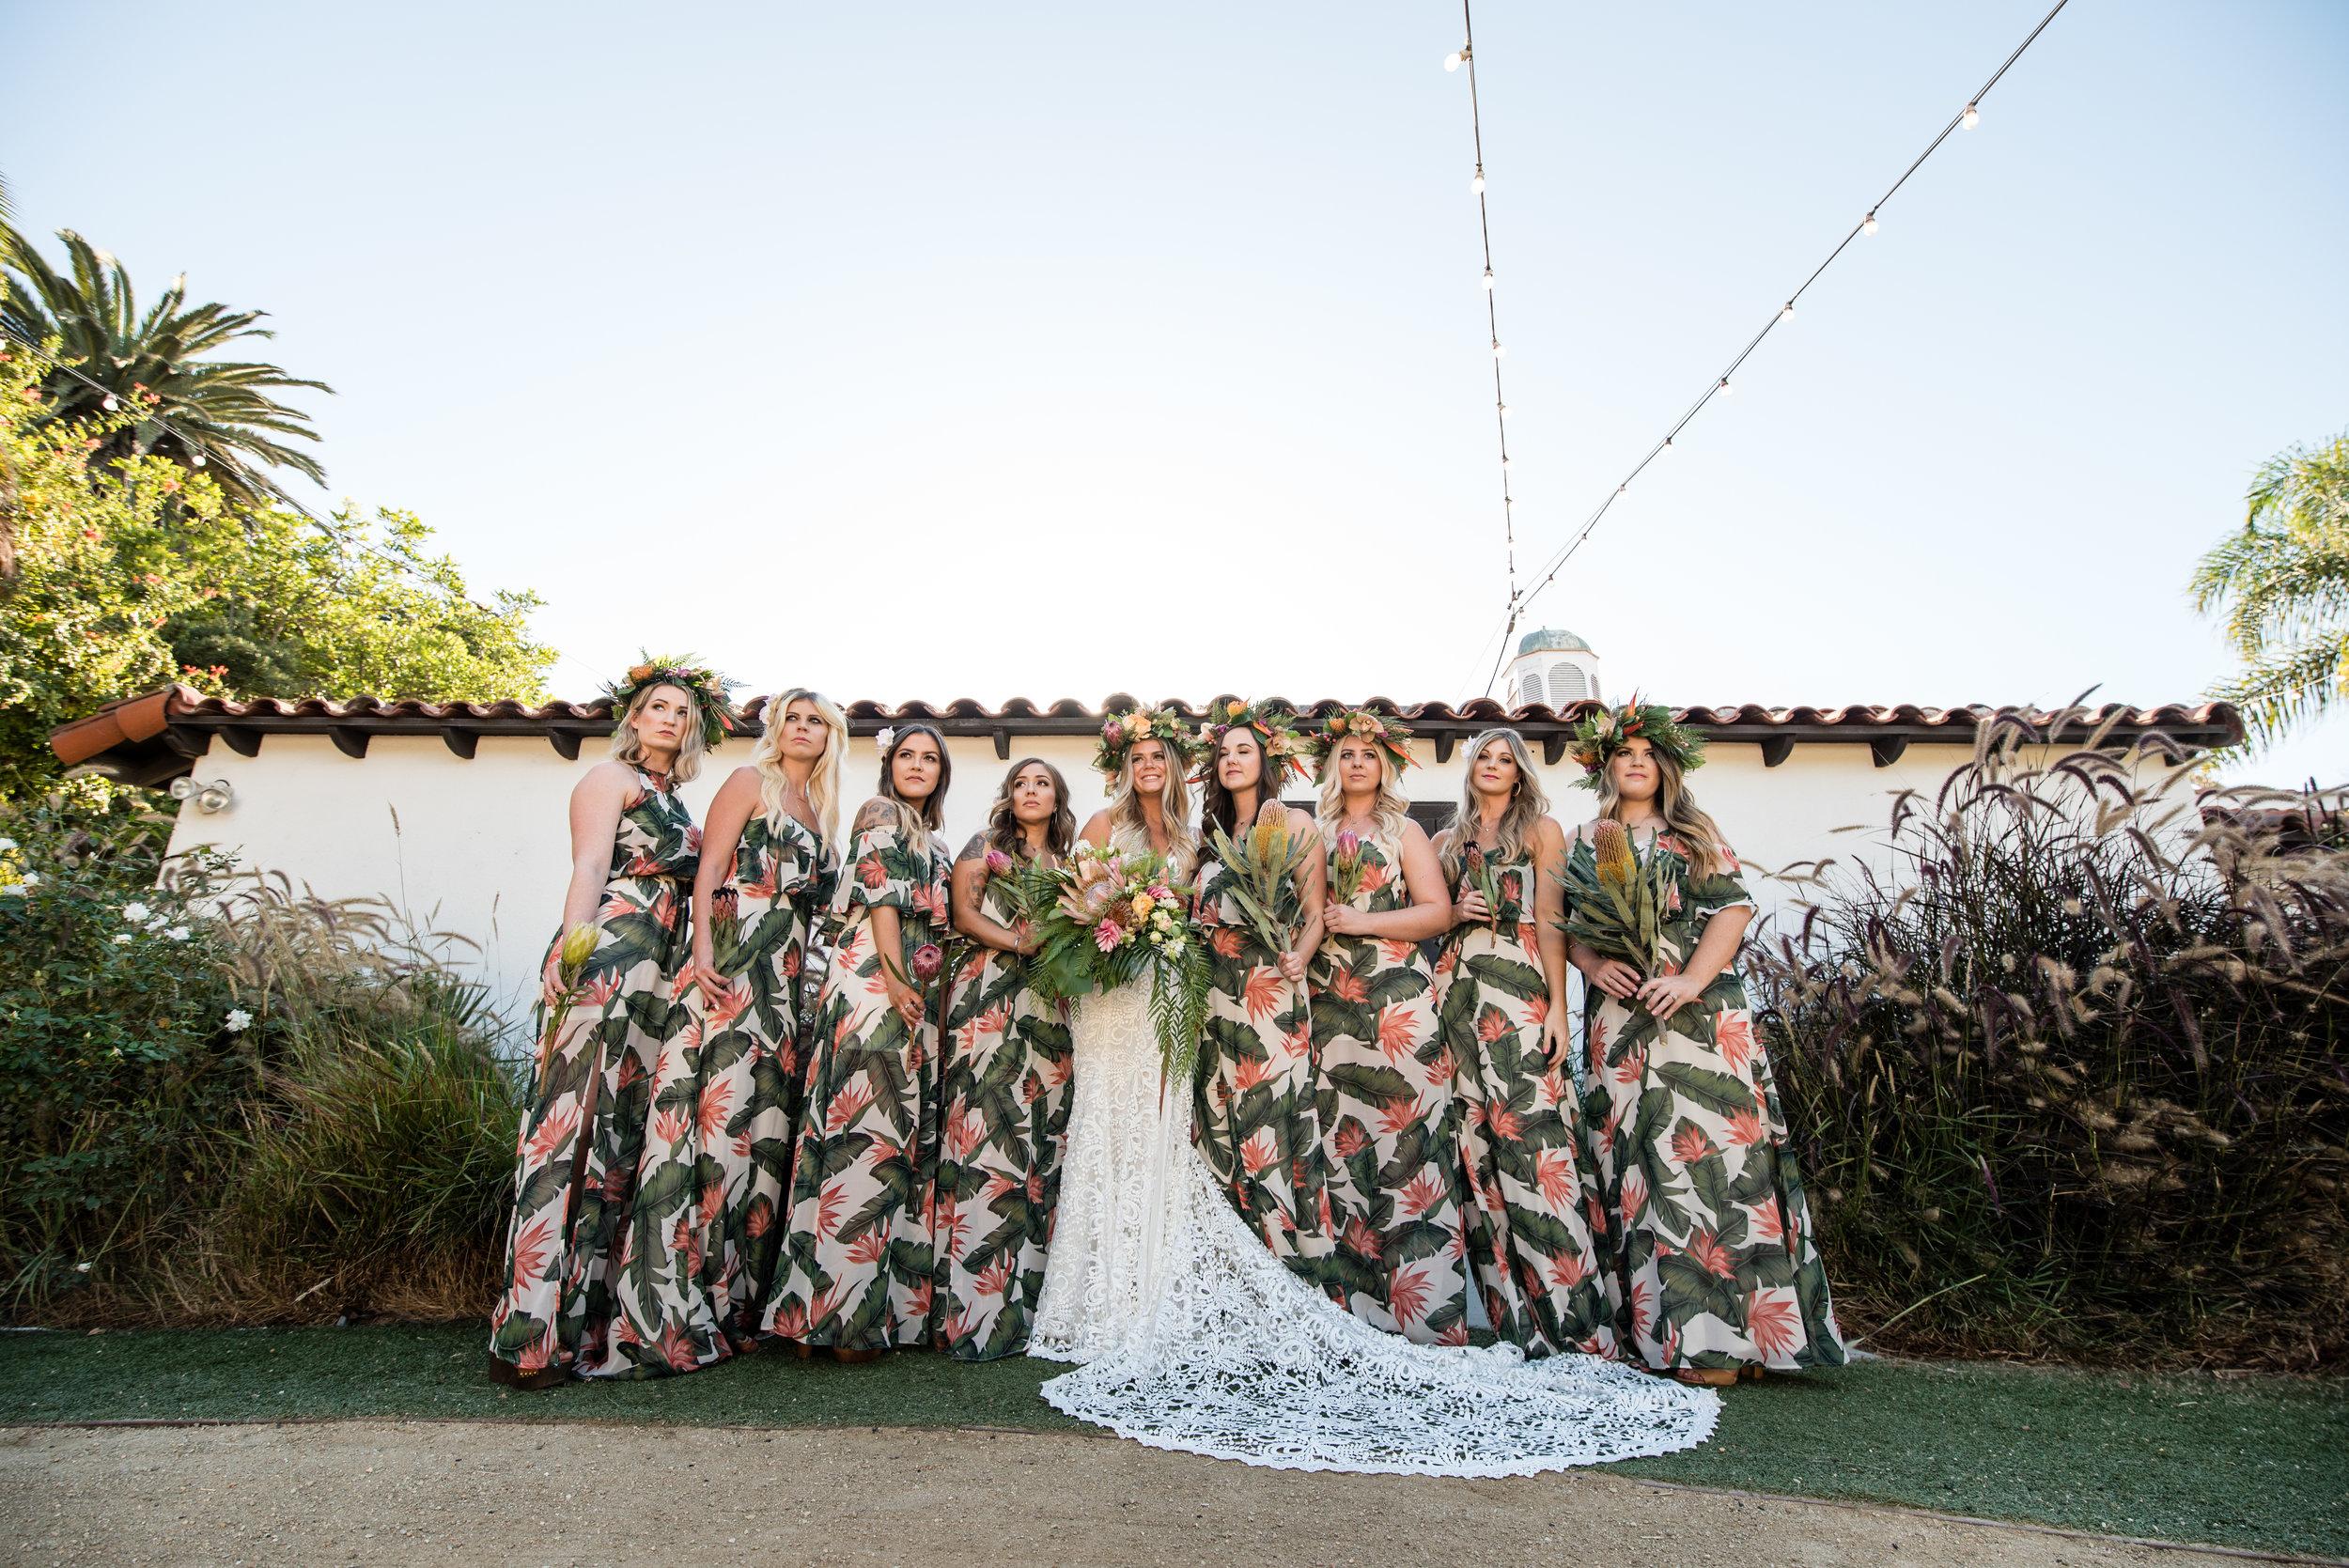 chelsay+landon-wedding-115.jpg